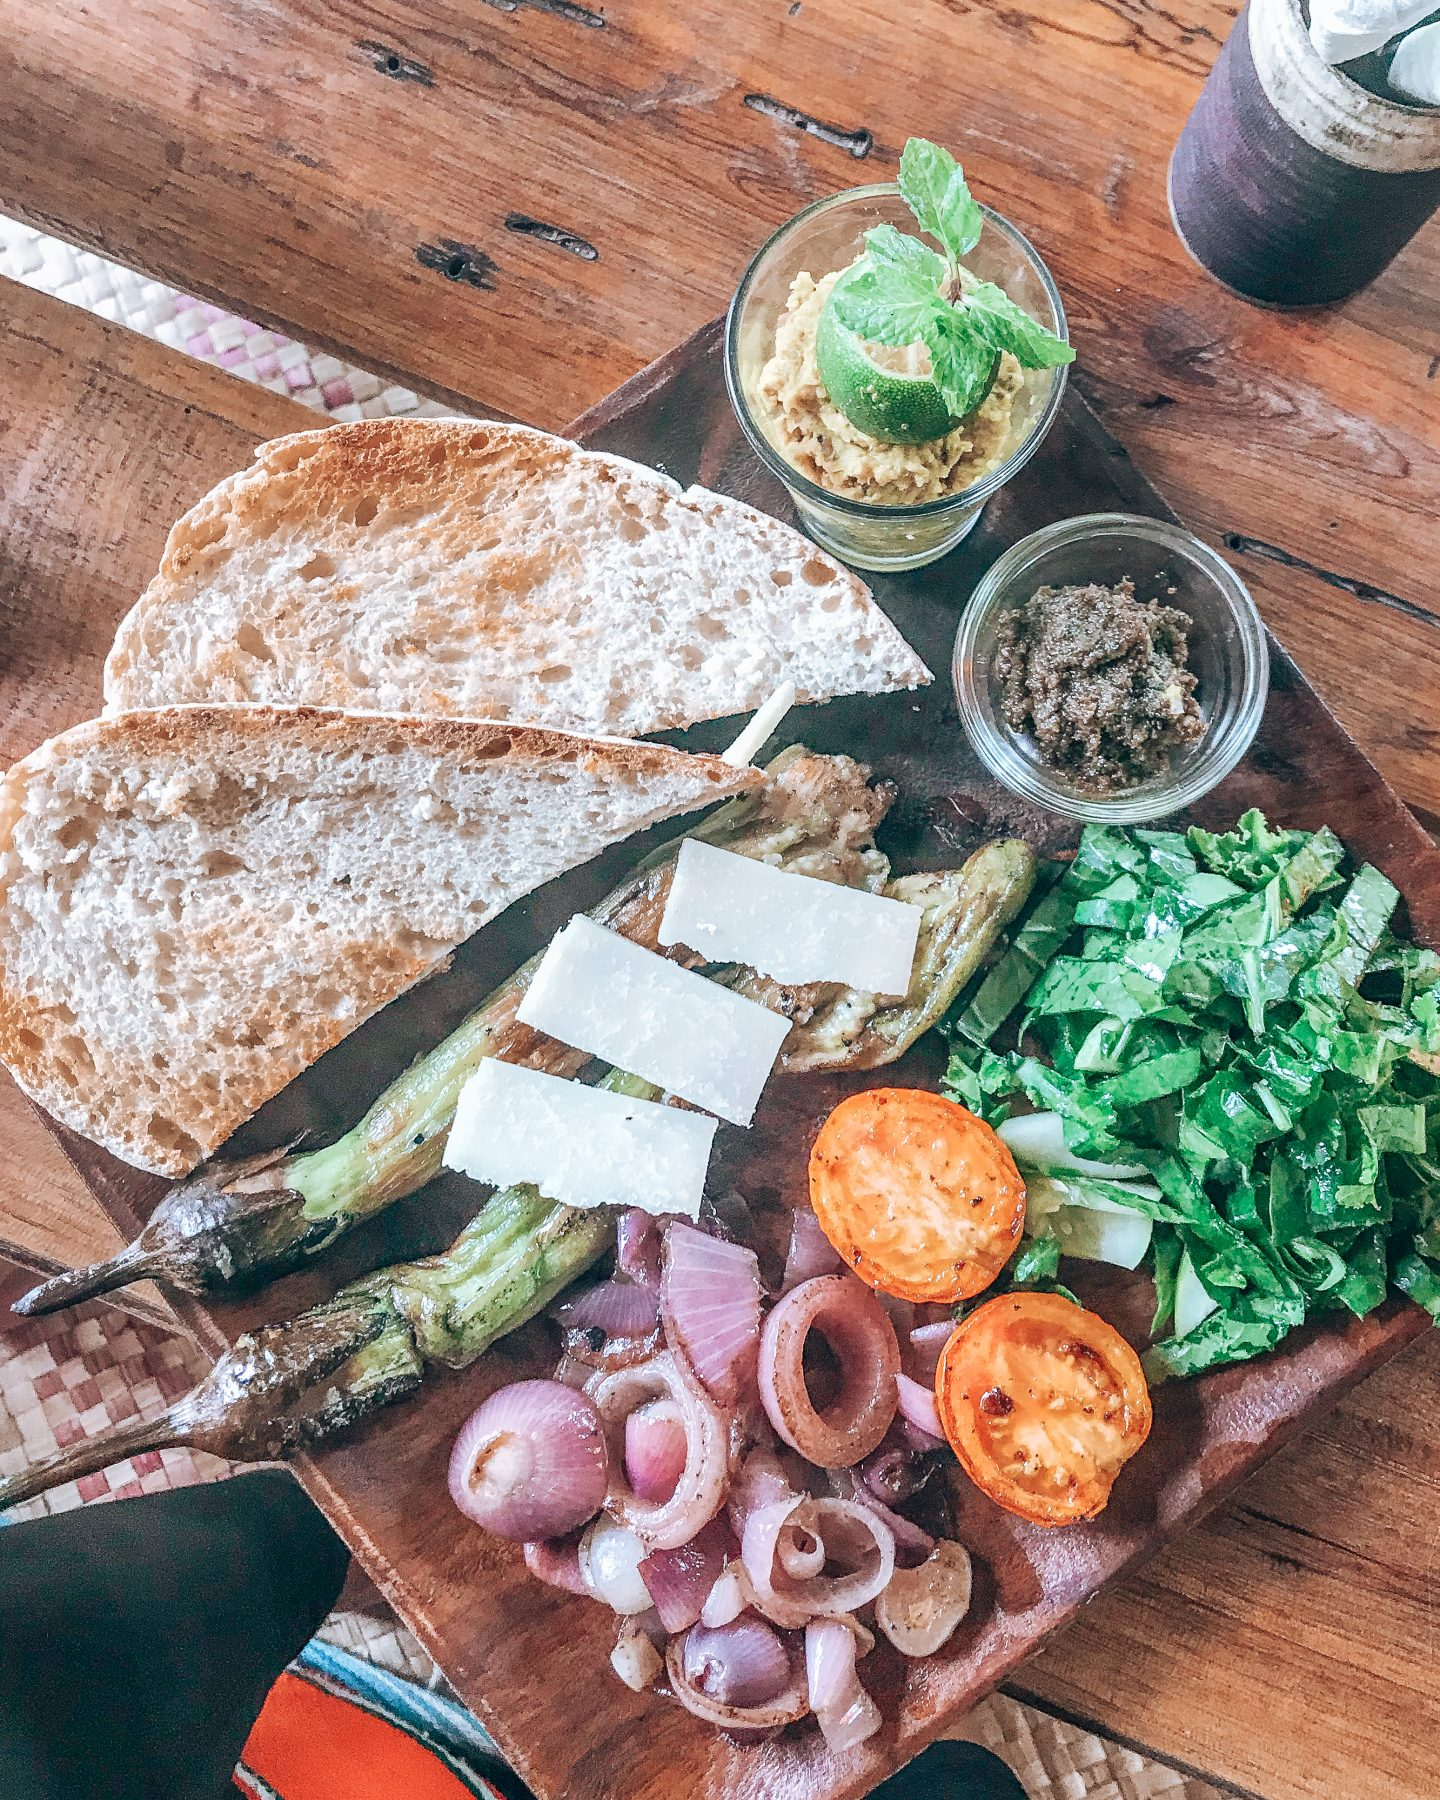 veggie food siargao: Vegetable platter at Common Ground